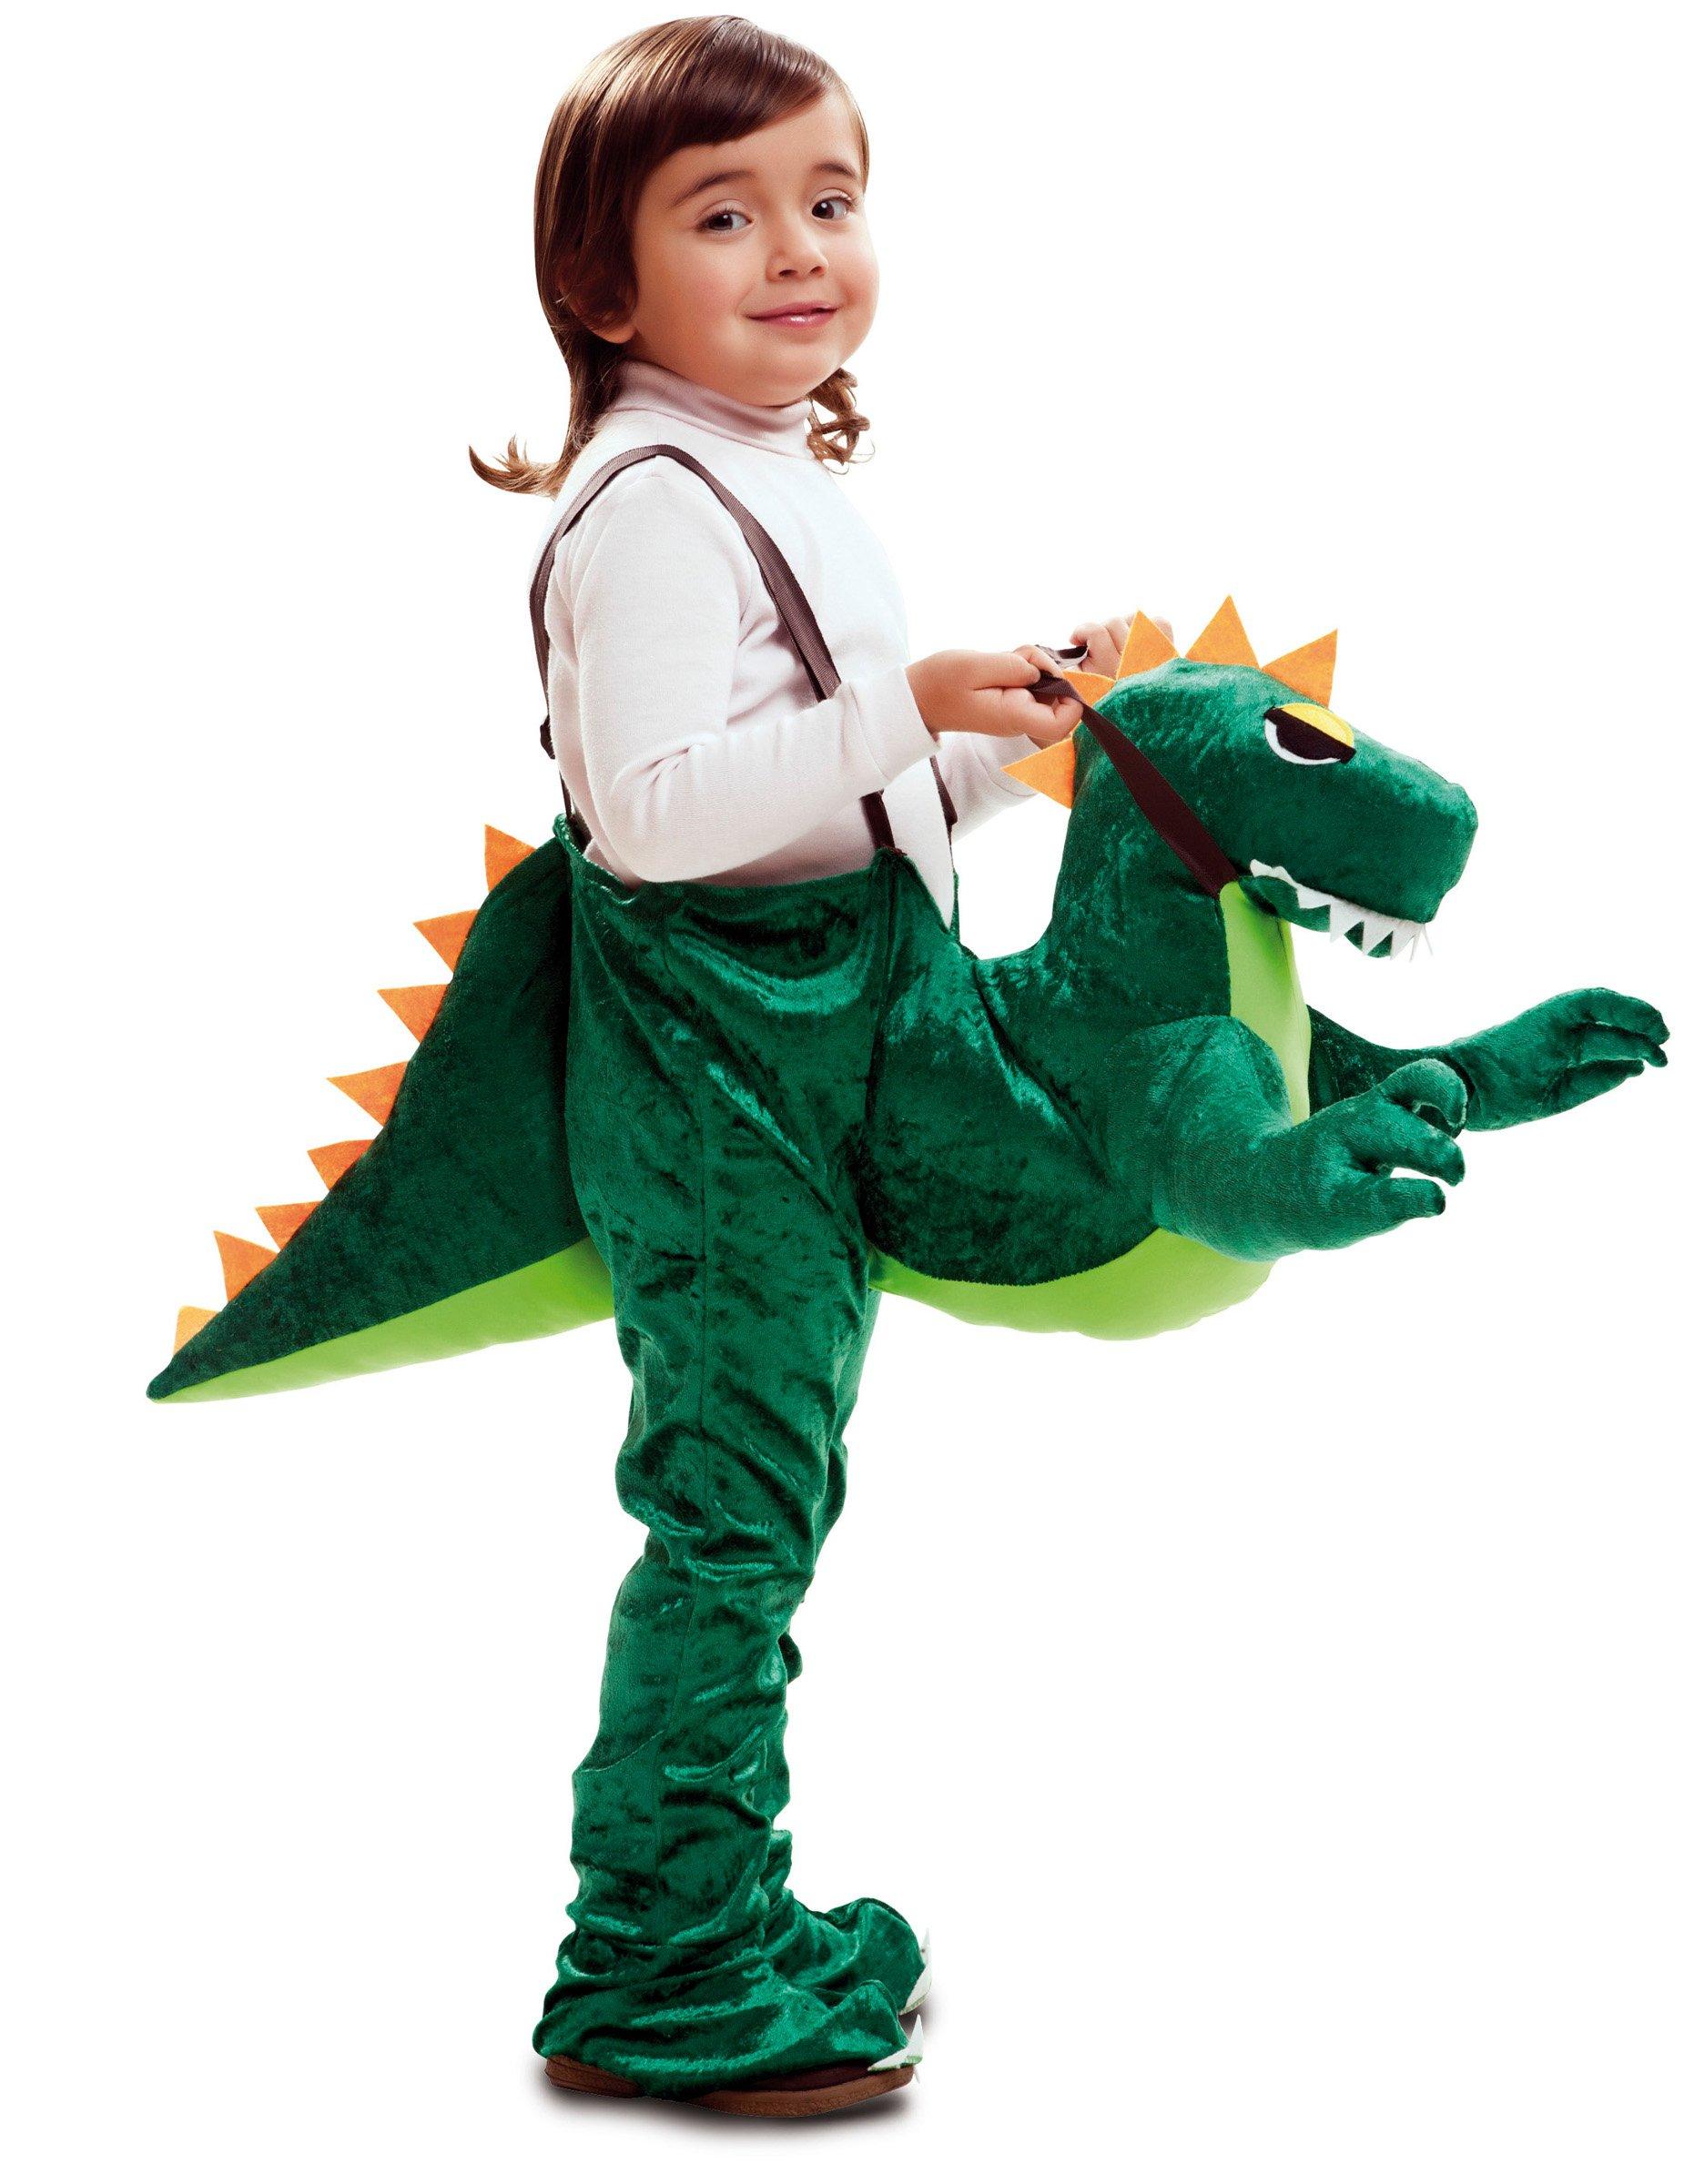 baby kost m dinosaurier mit schnuller kost me f r kinder und g nstige faschingskost me vegaoo. Black Bedroom Furniture Sets. Home Design Ideas